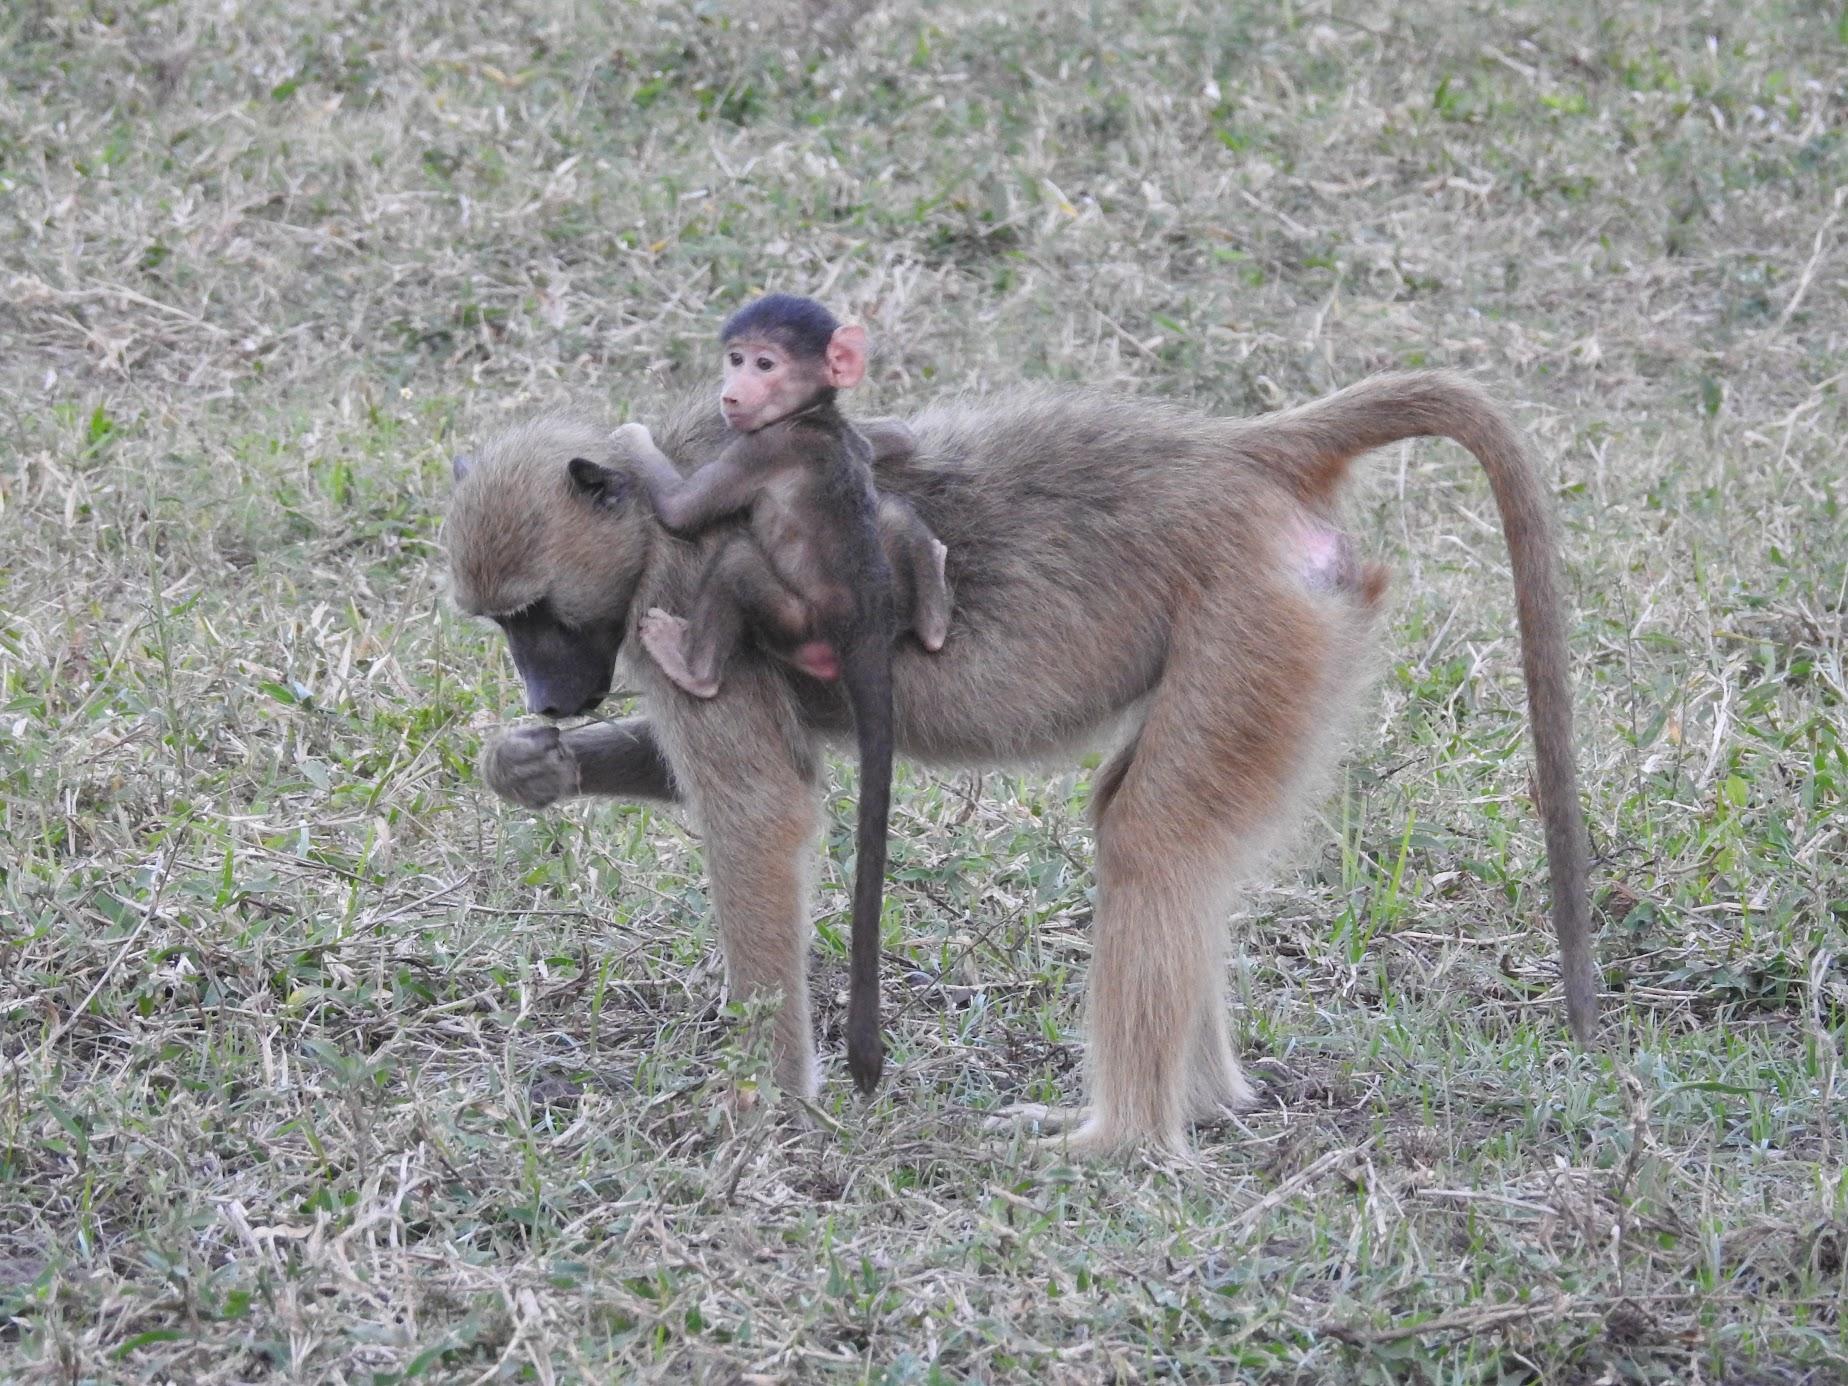 Paleo-Primate Project, Gorongosa - Baboon, season 2018. Photo by René Bobe